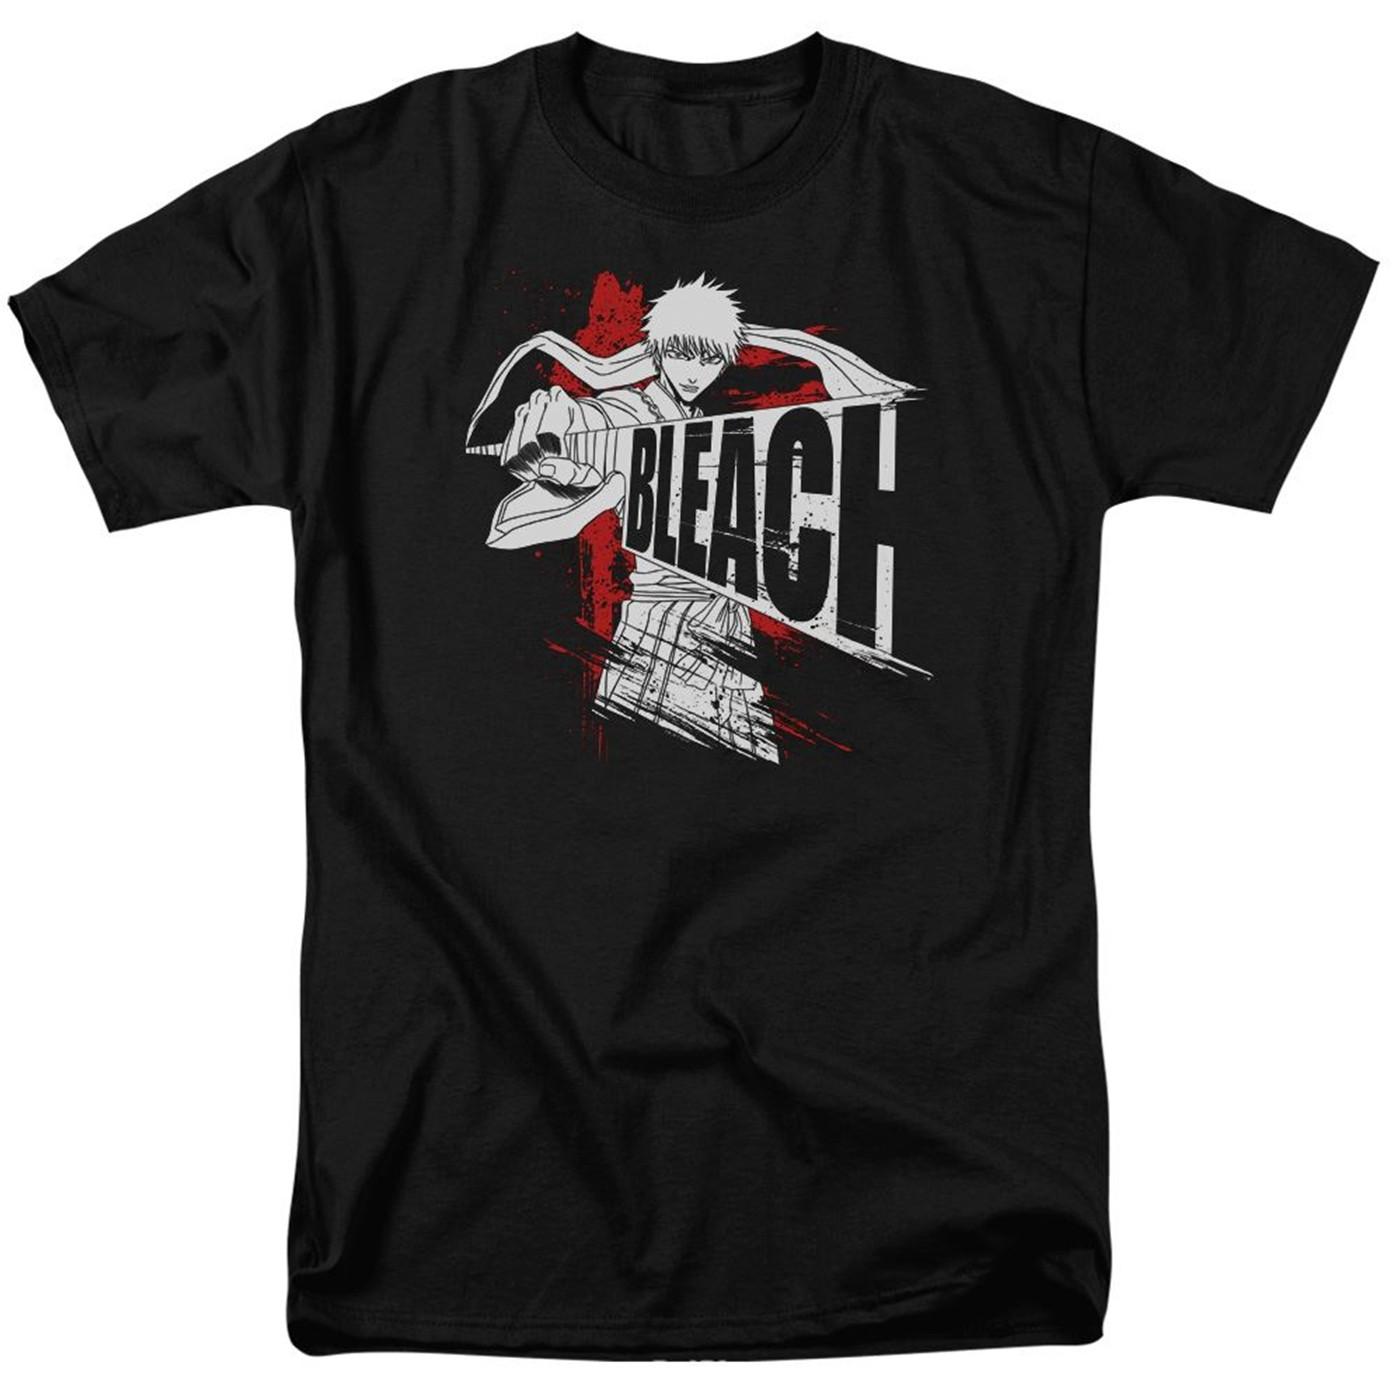 Bleach Sword Drawn Black Men's T-Shirt